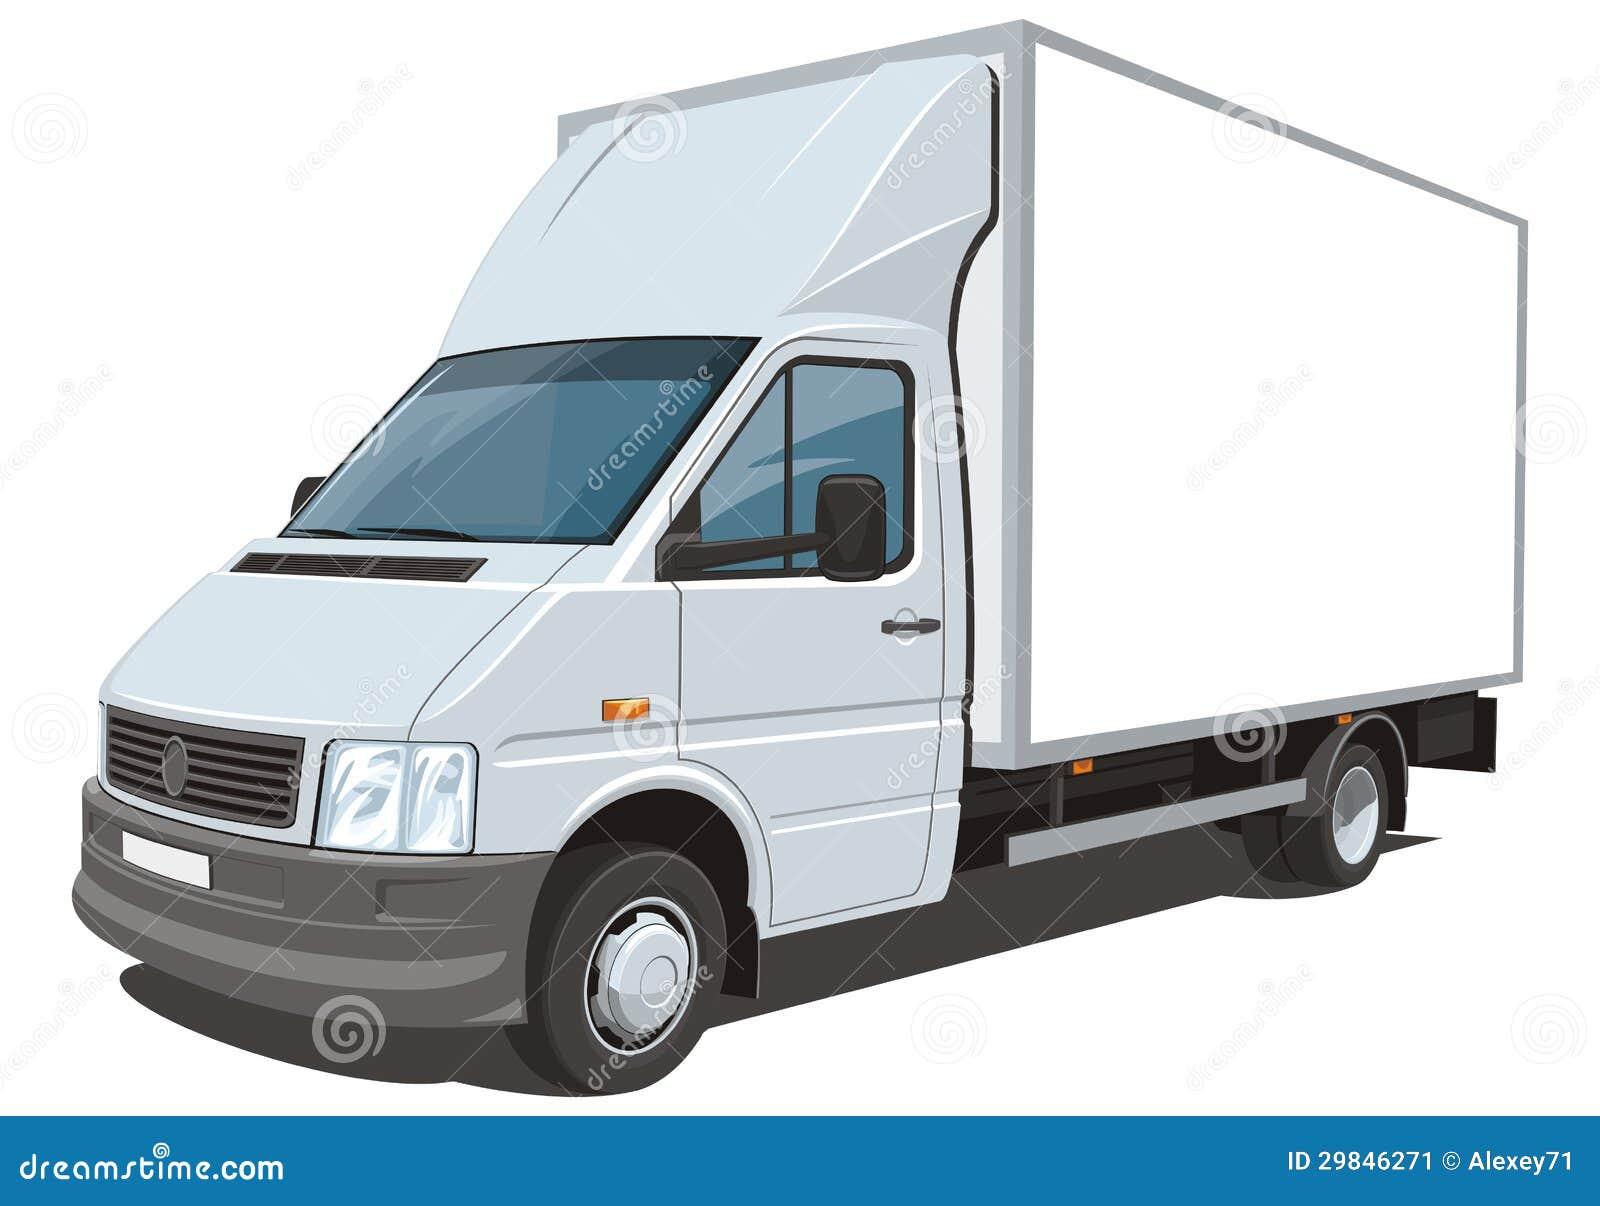 camion de livraison image stock image 29846271. Black Bedroom Furniture Sets. Home Design Ideas